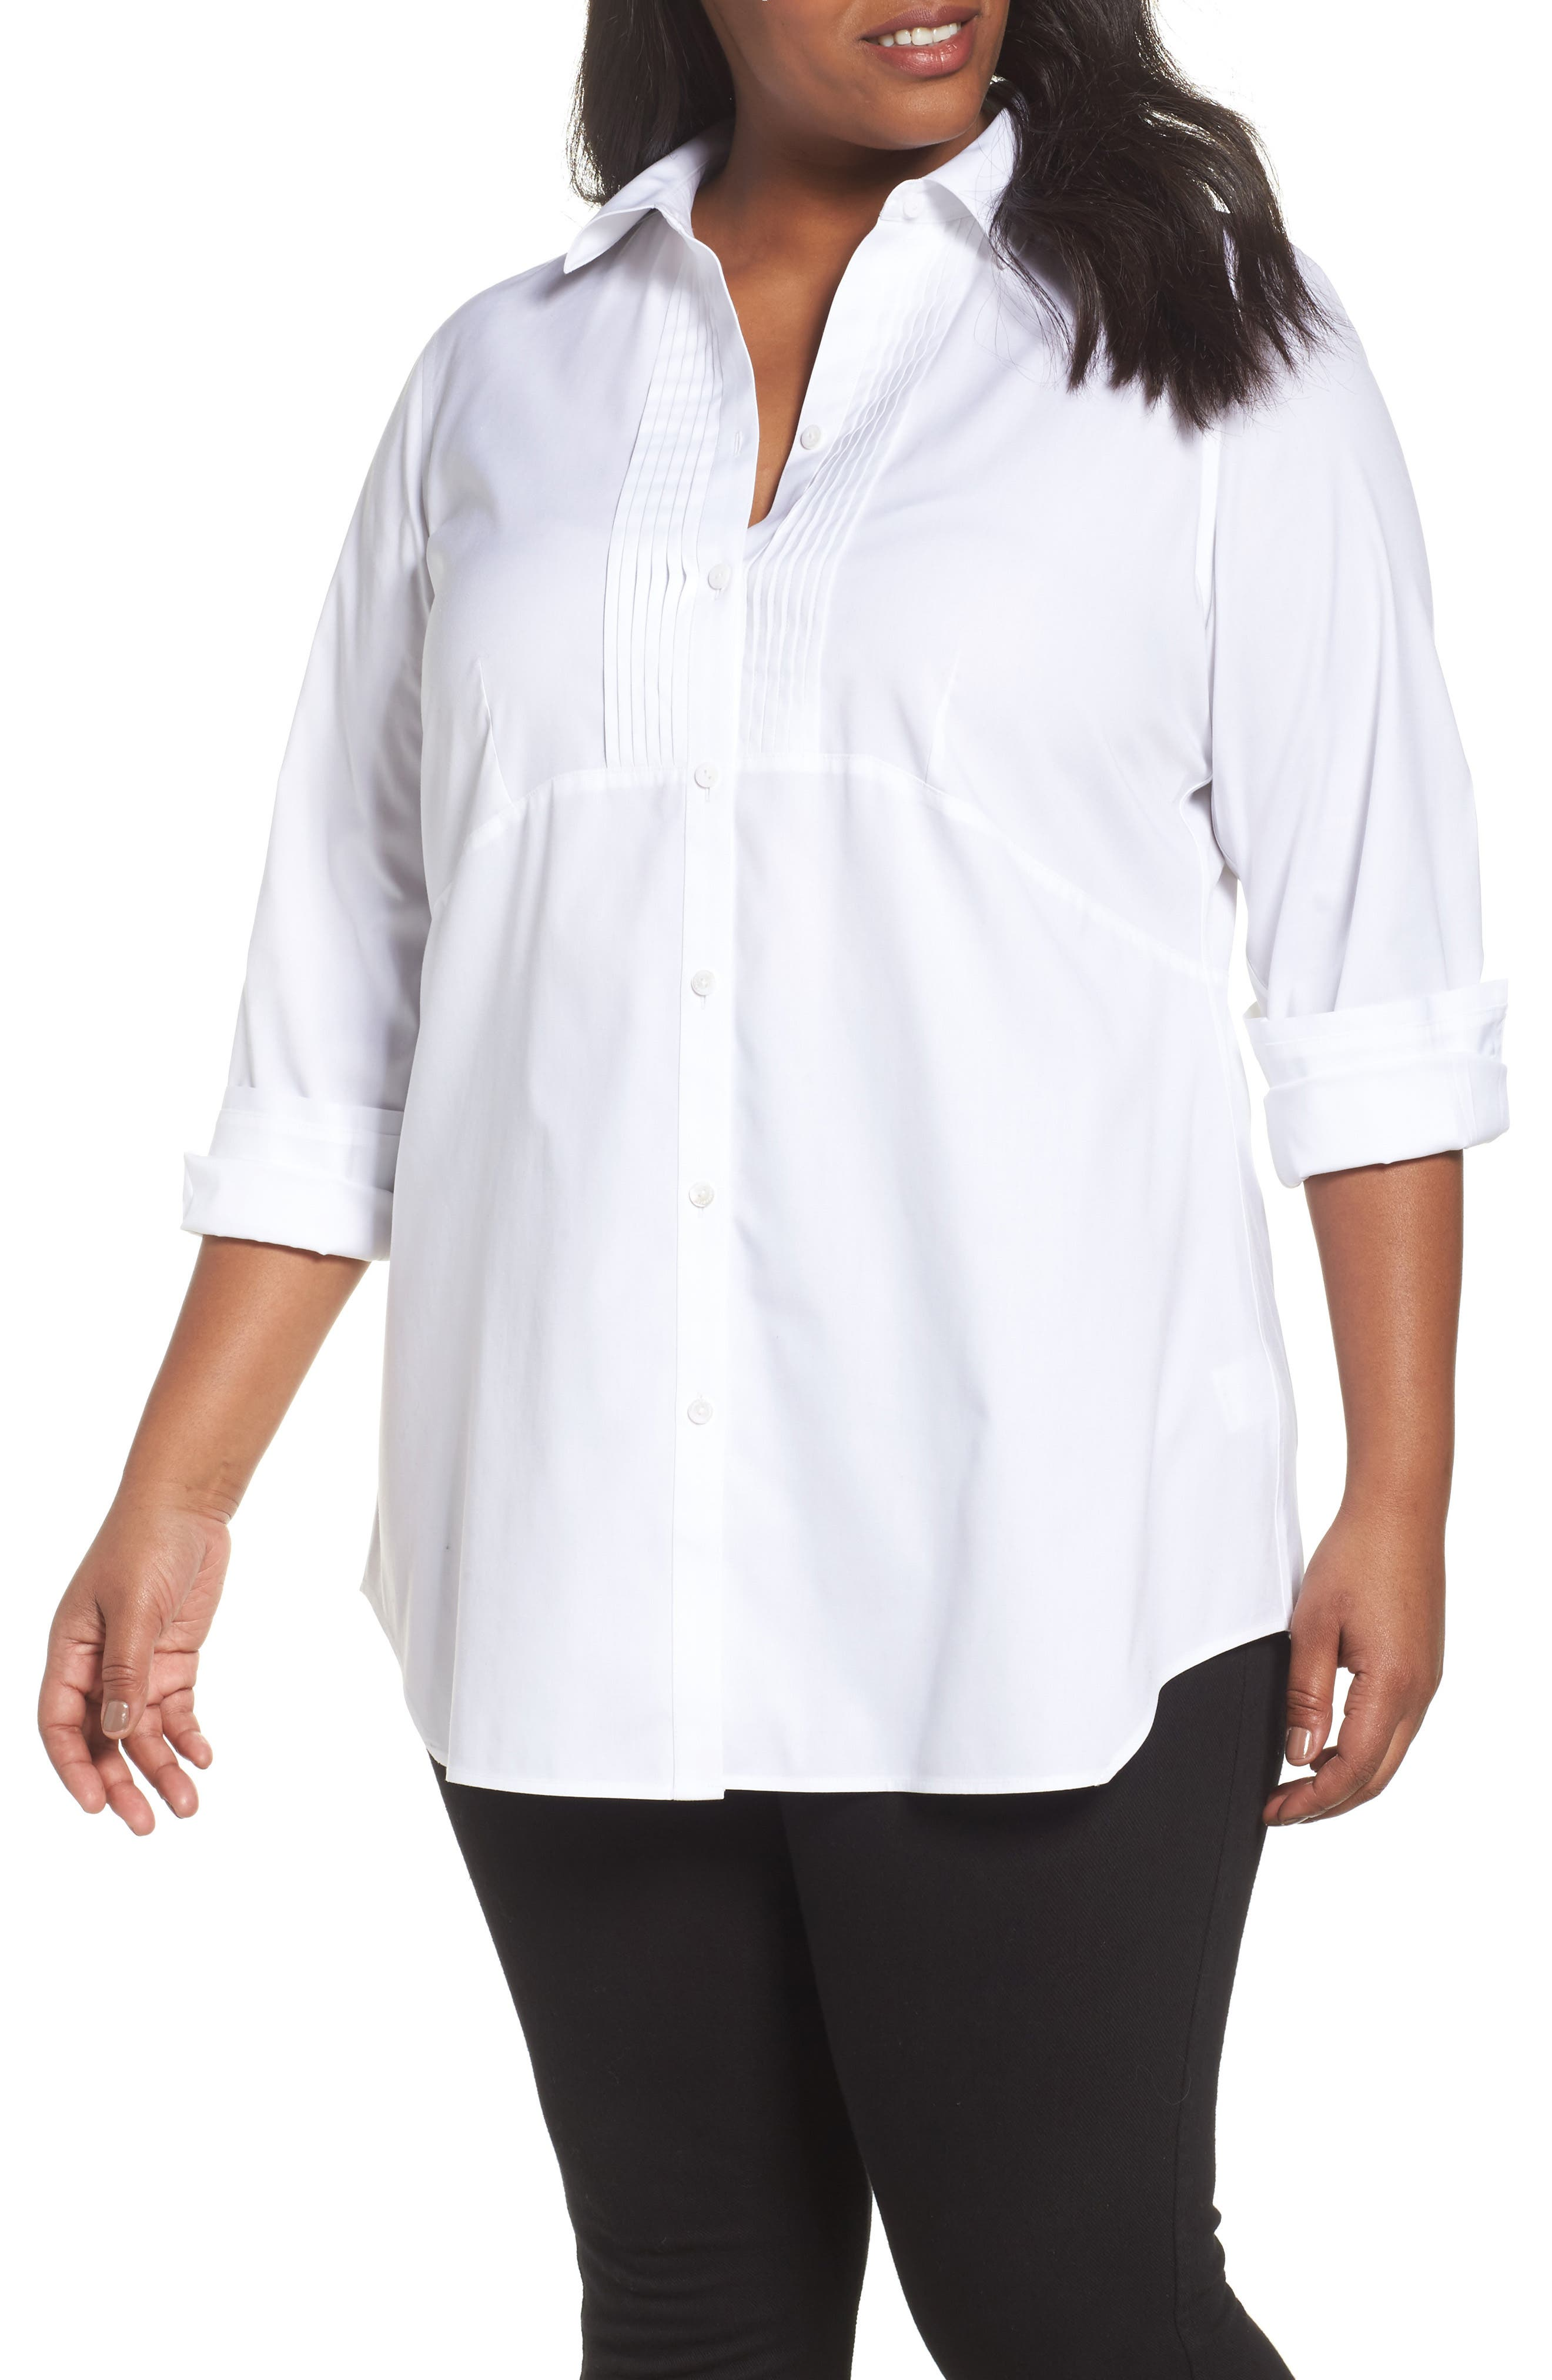 Alternate Image 1 Selected - Foxcroft Sheri Stretch Cotton Shirt (Plus Size)